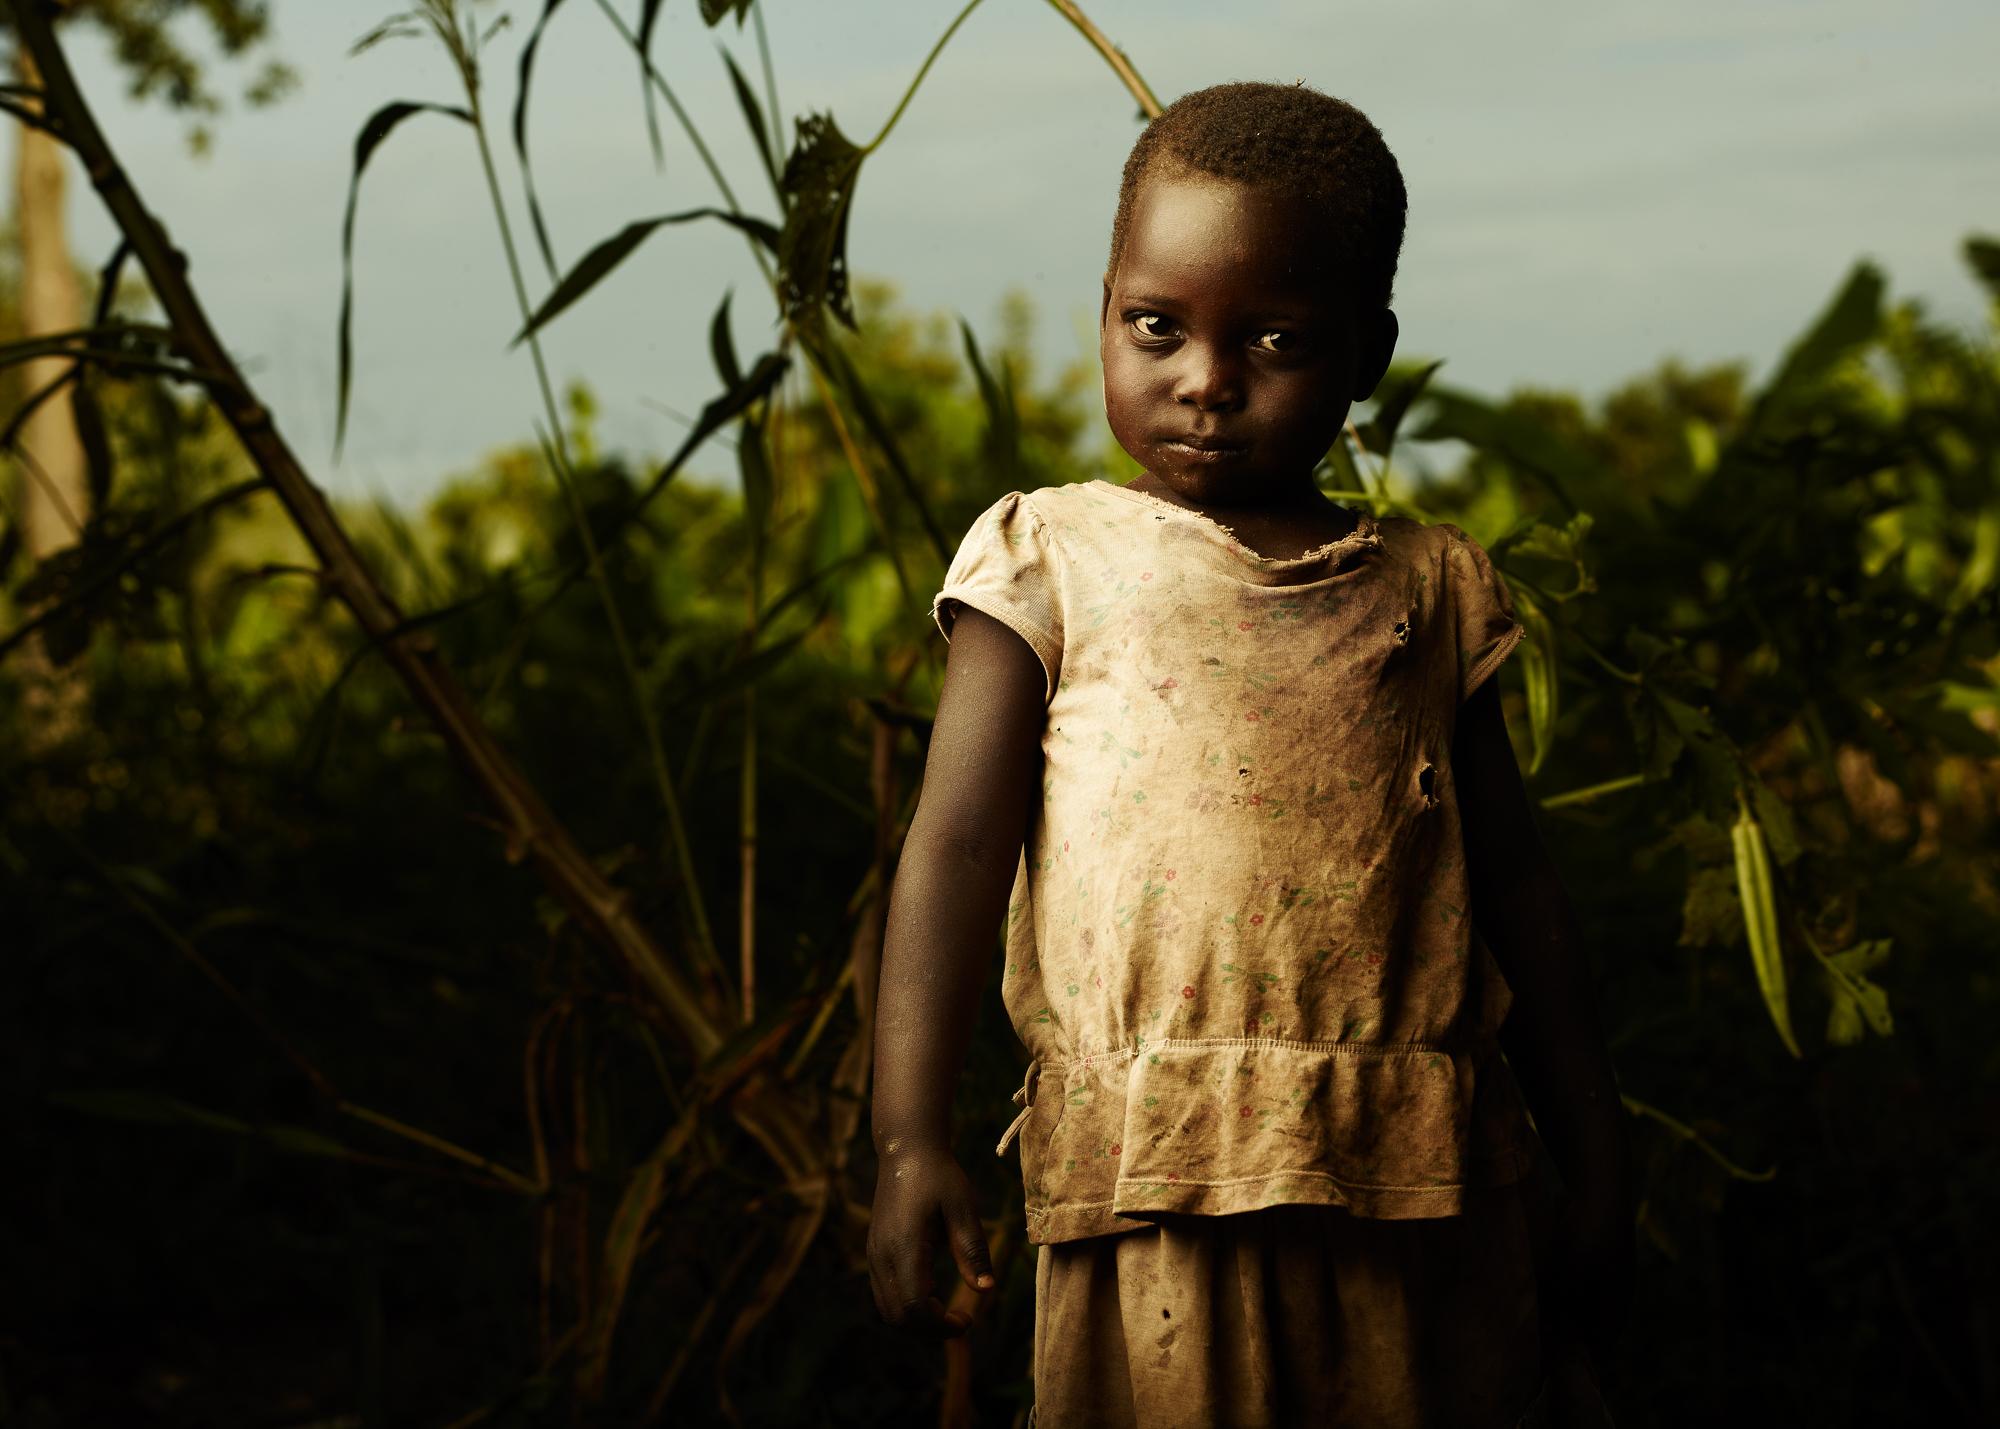 Exile_Uganda-007366.jpg